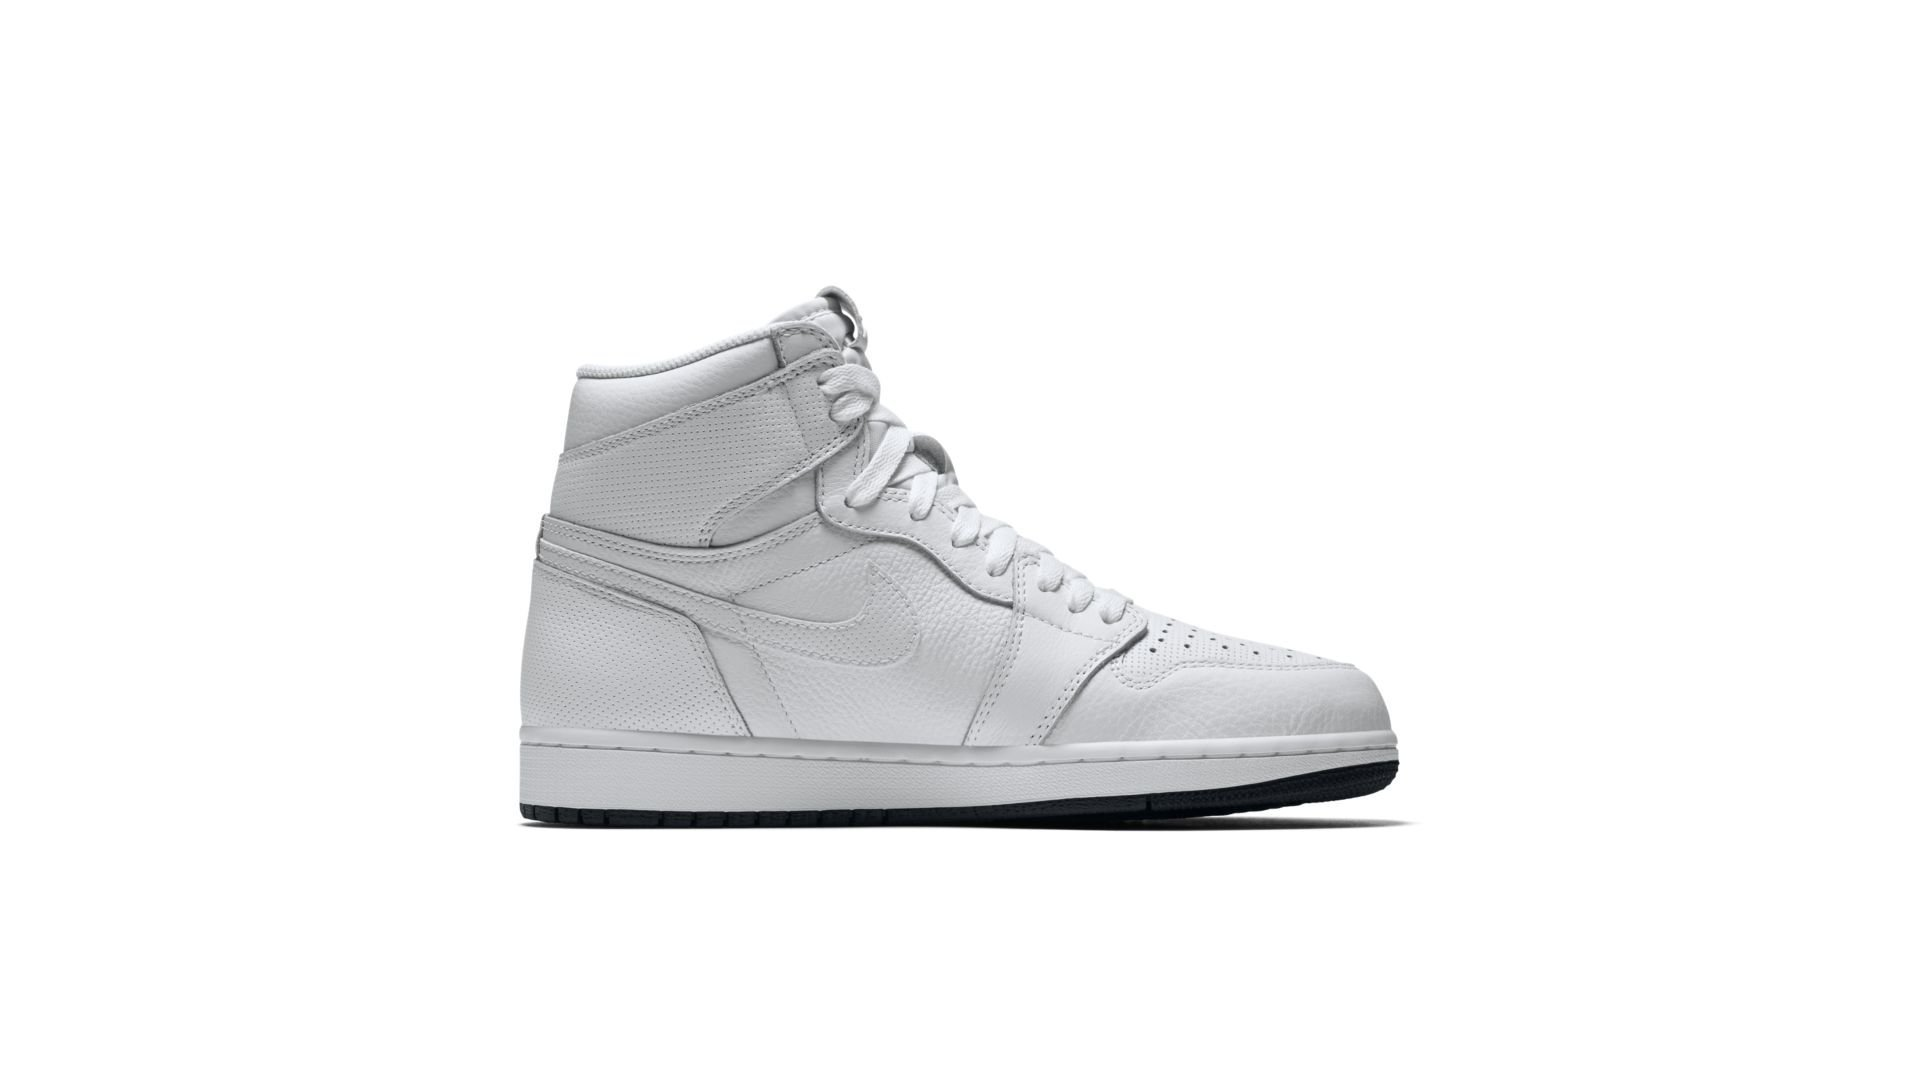 Jordan 1 Retro White Perforated (555088-100)